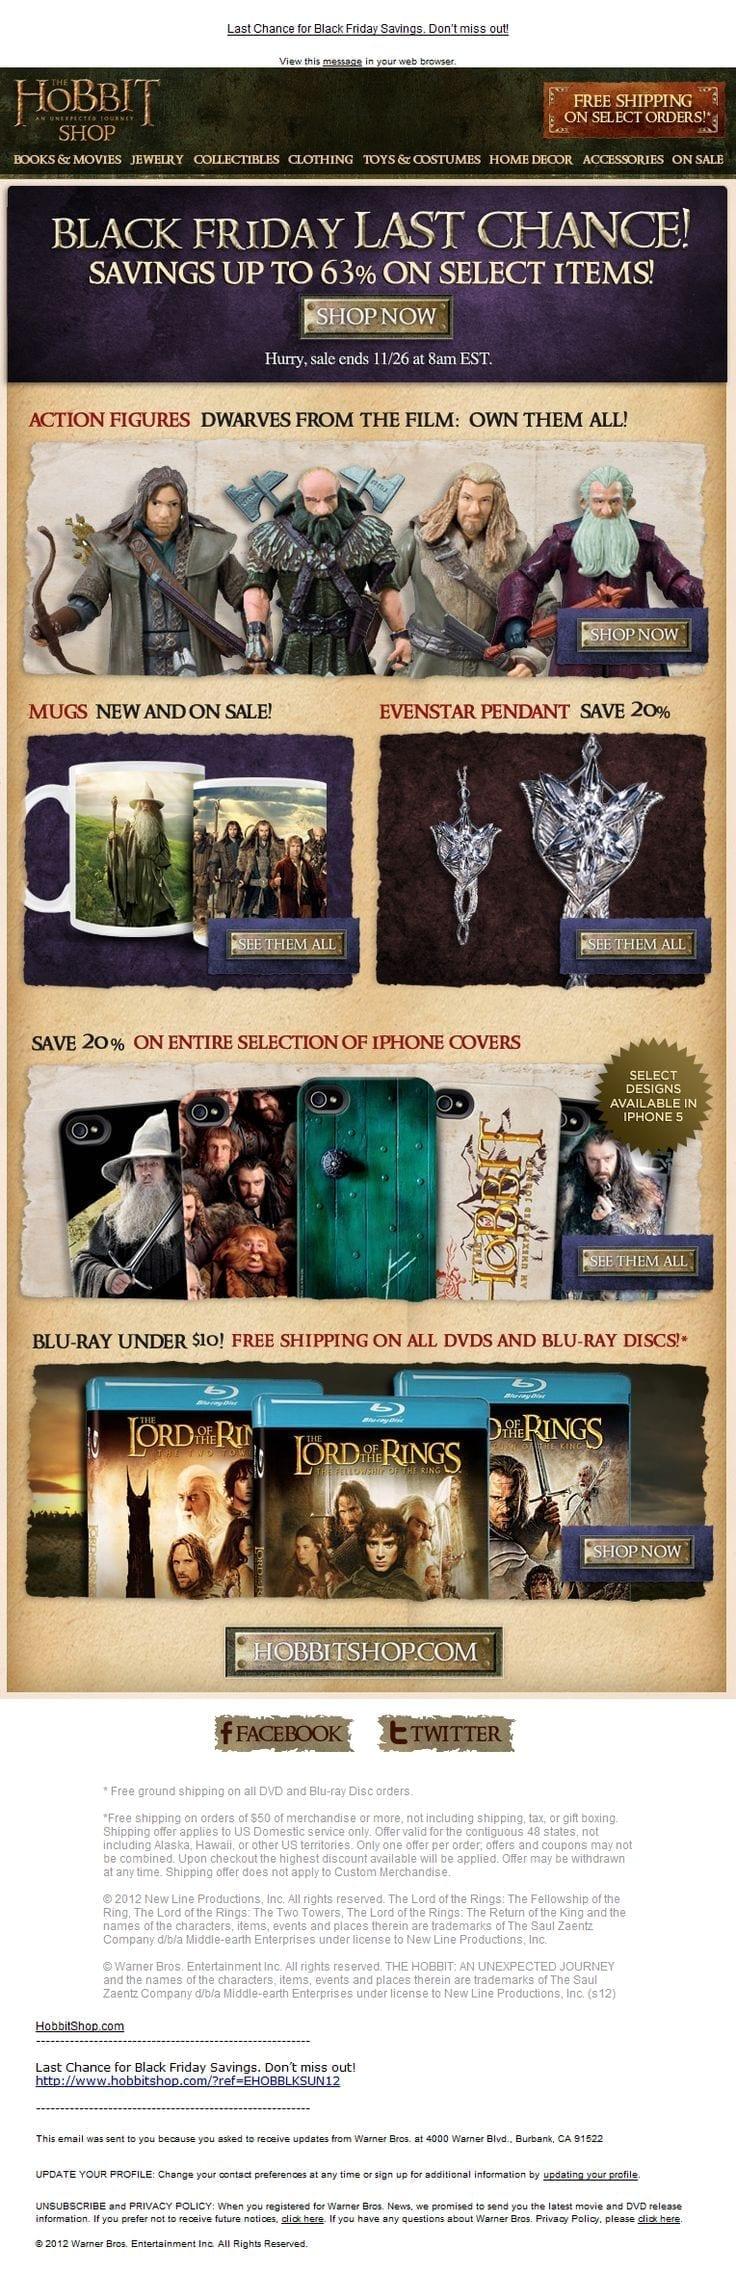 The Hobbit Shop Black Friday Email